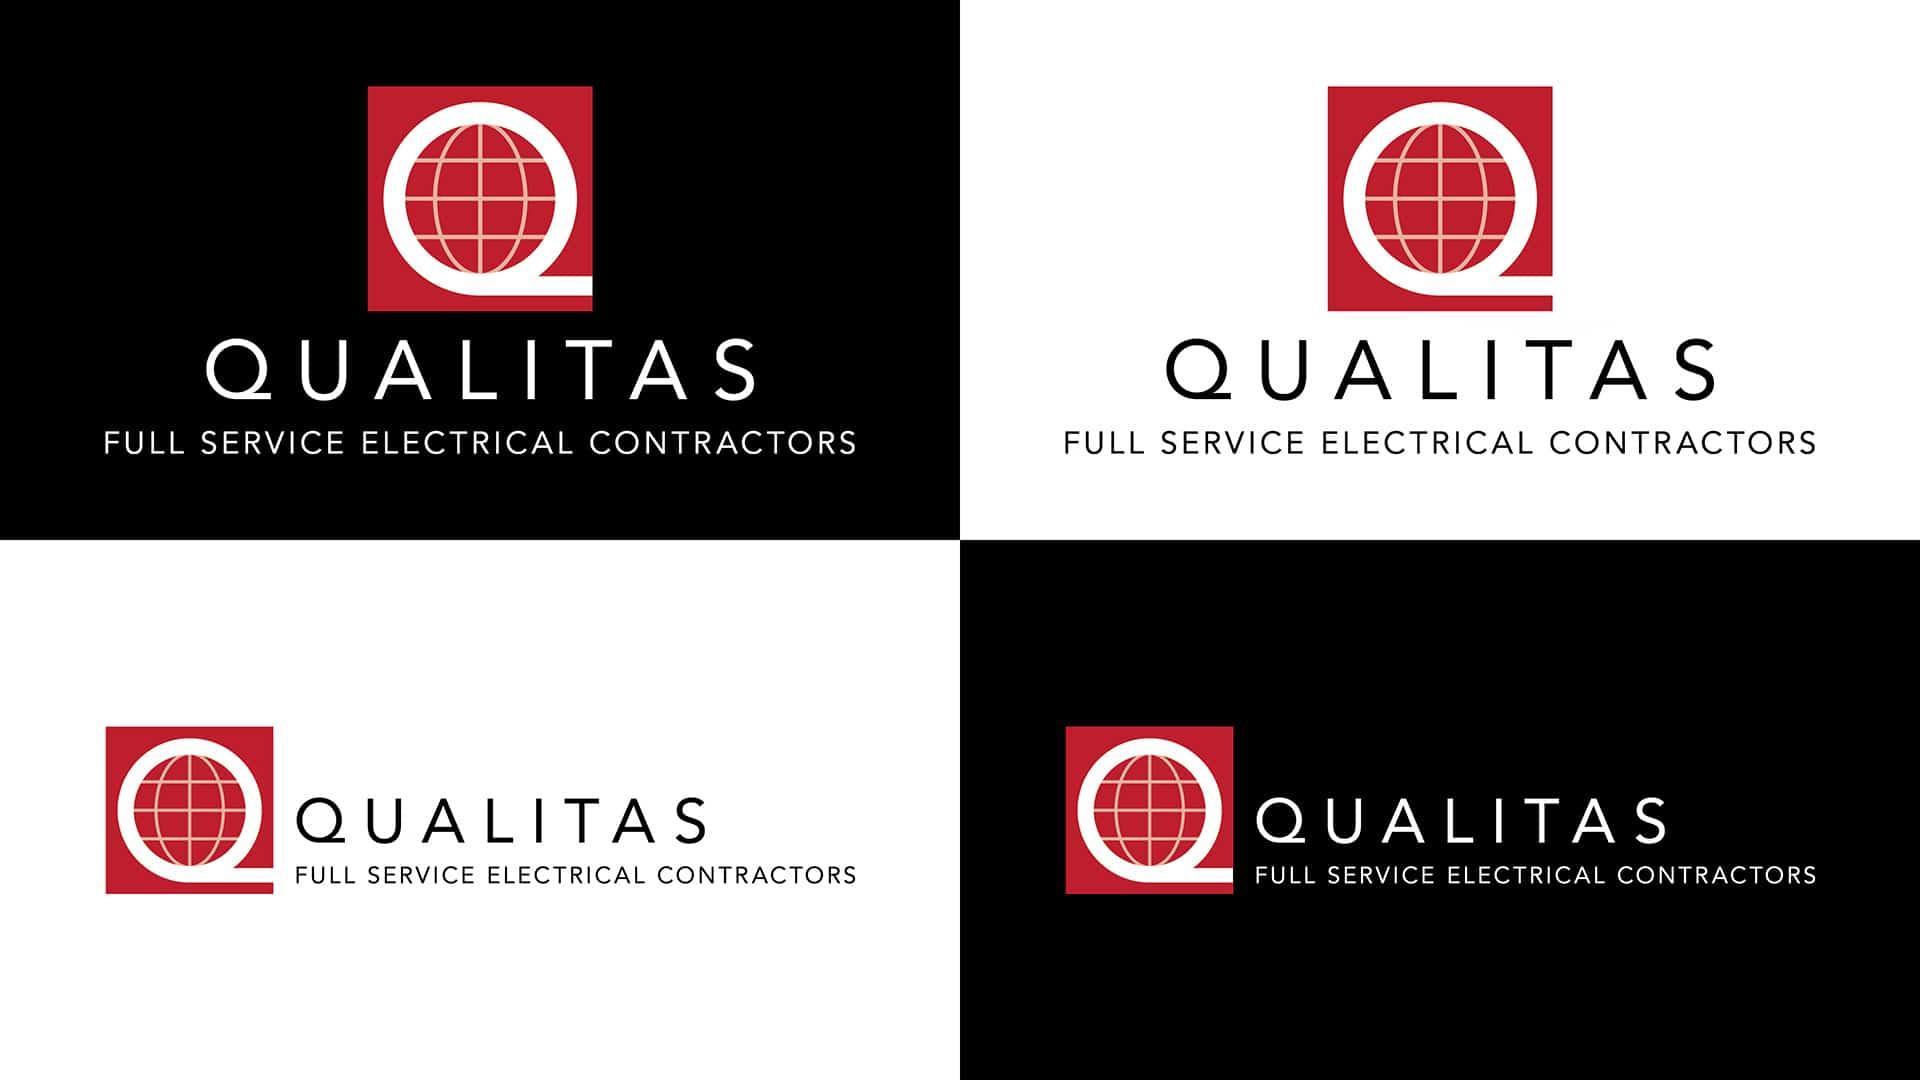 Qualitas Image 3